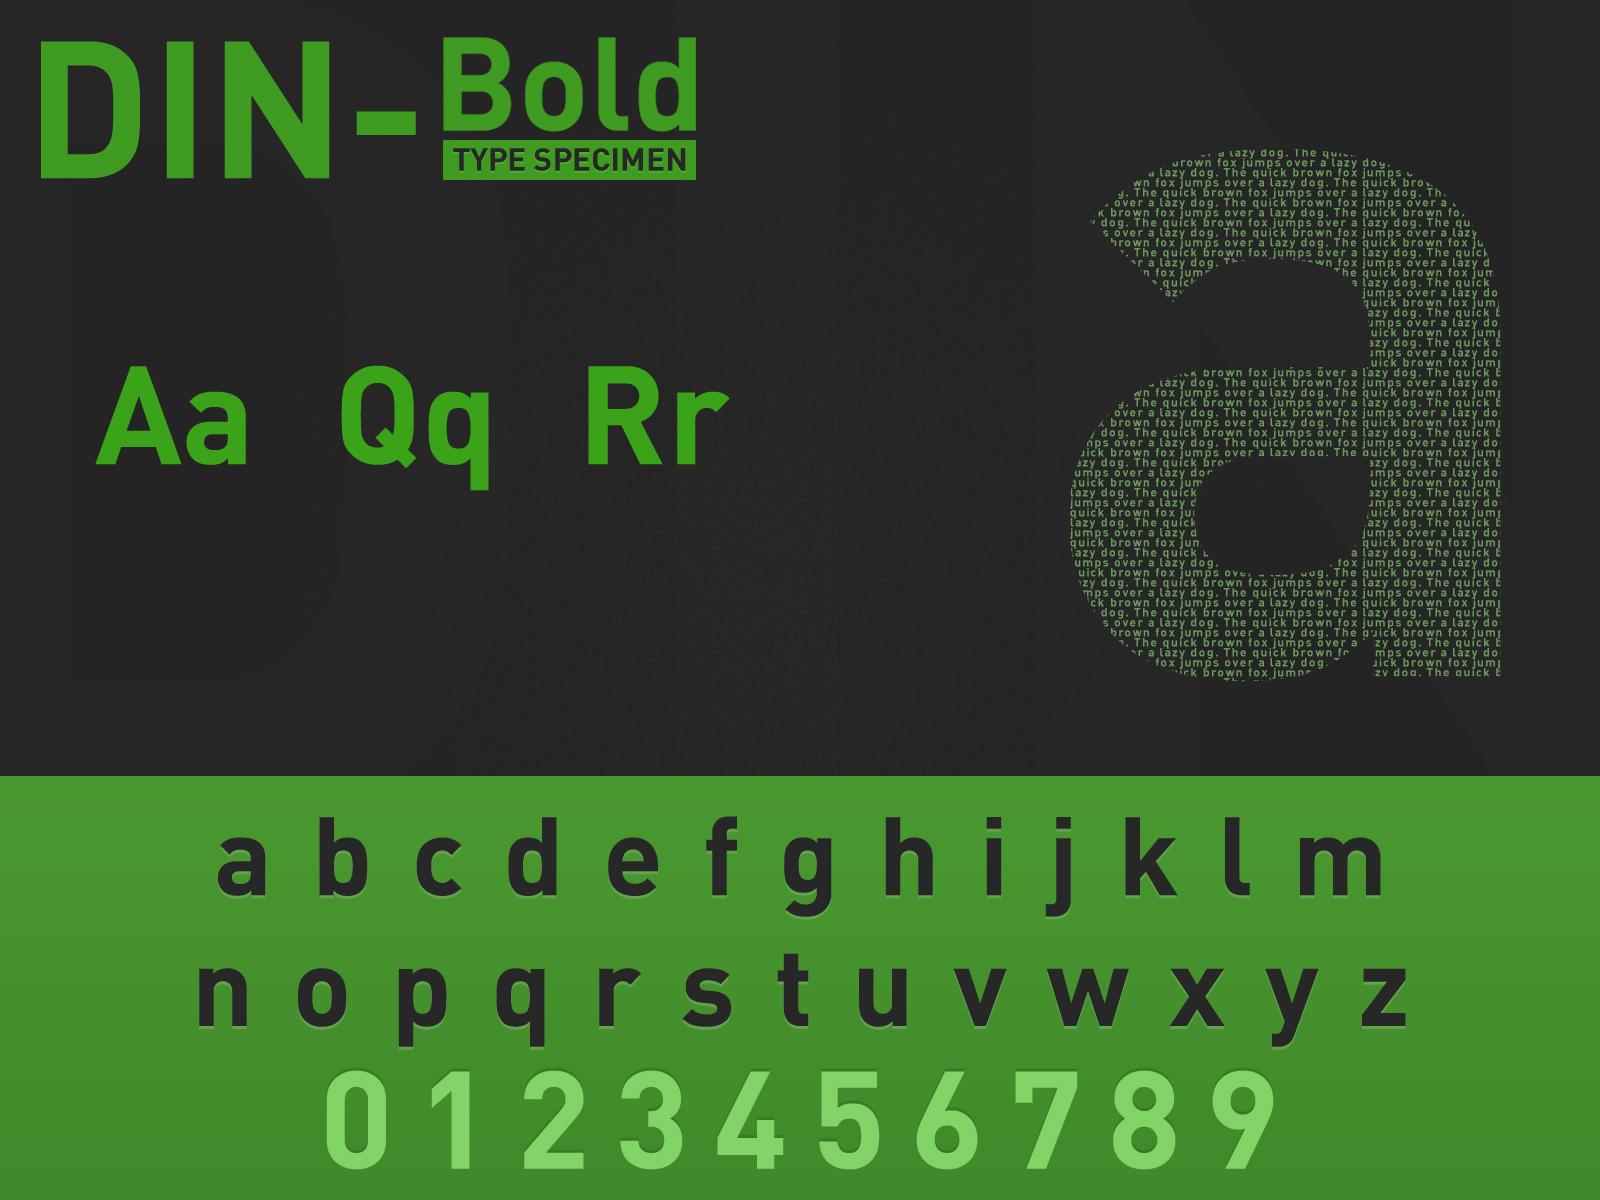 DIN-Bold Type Specimen by t1nus on DeviantArt